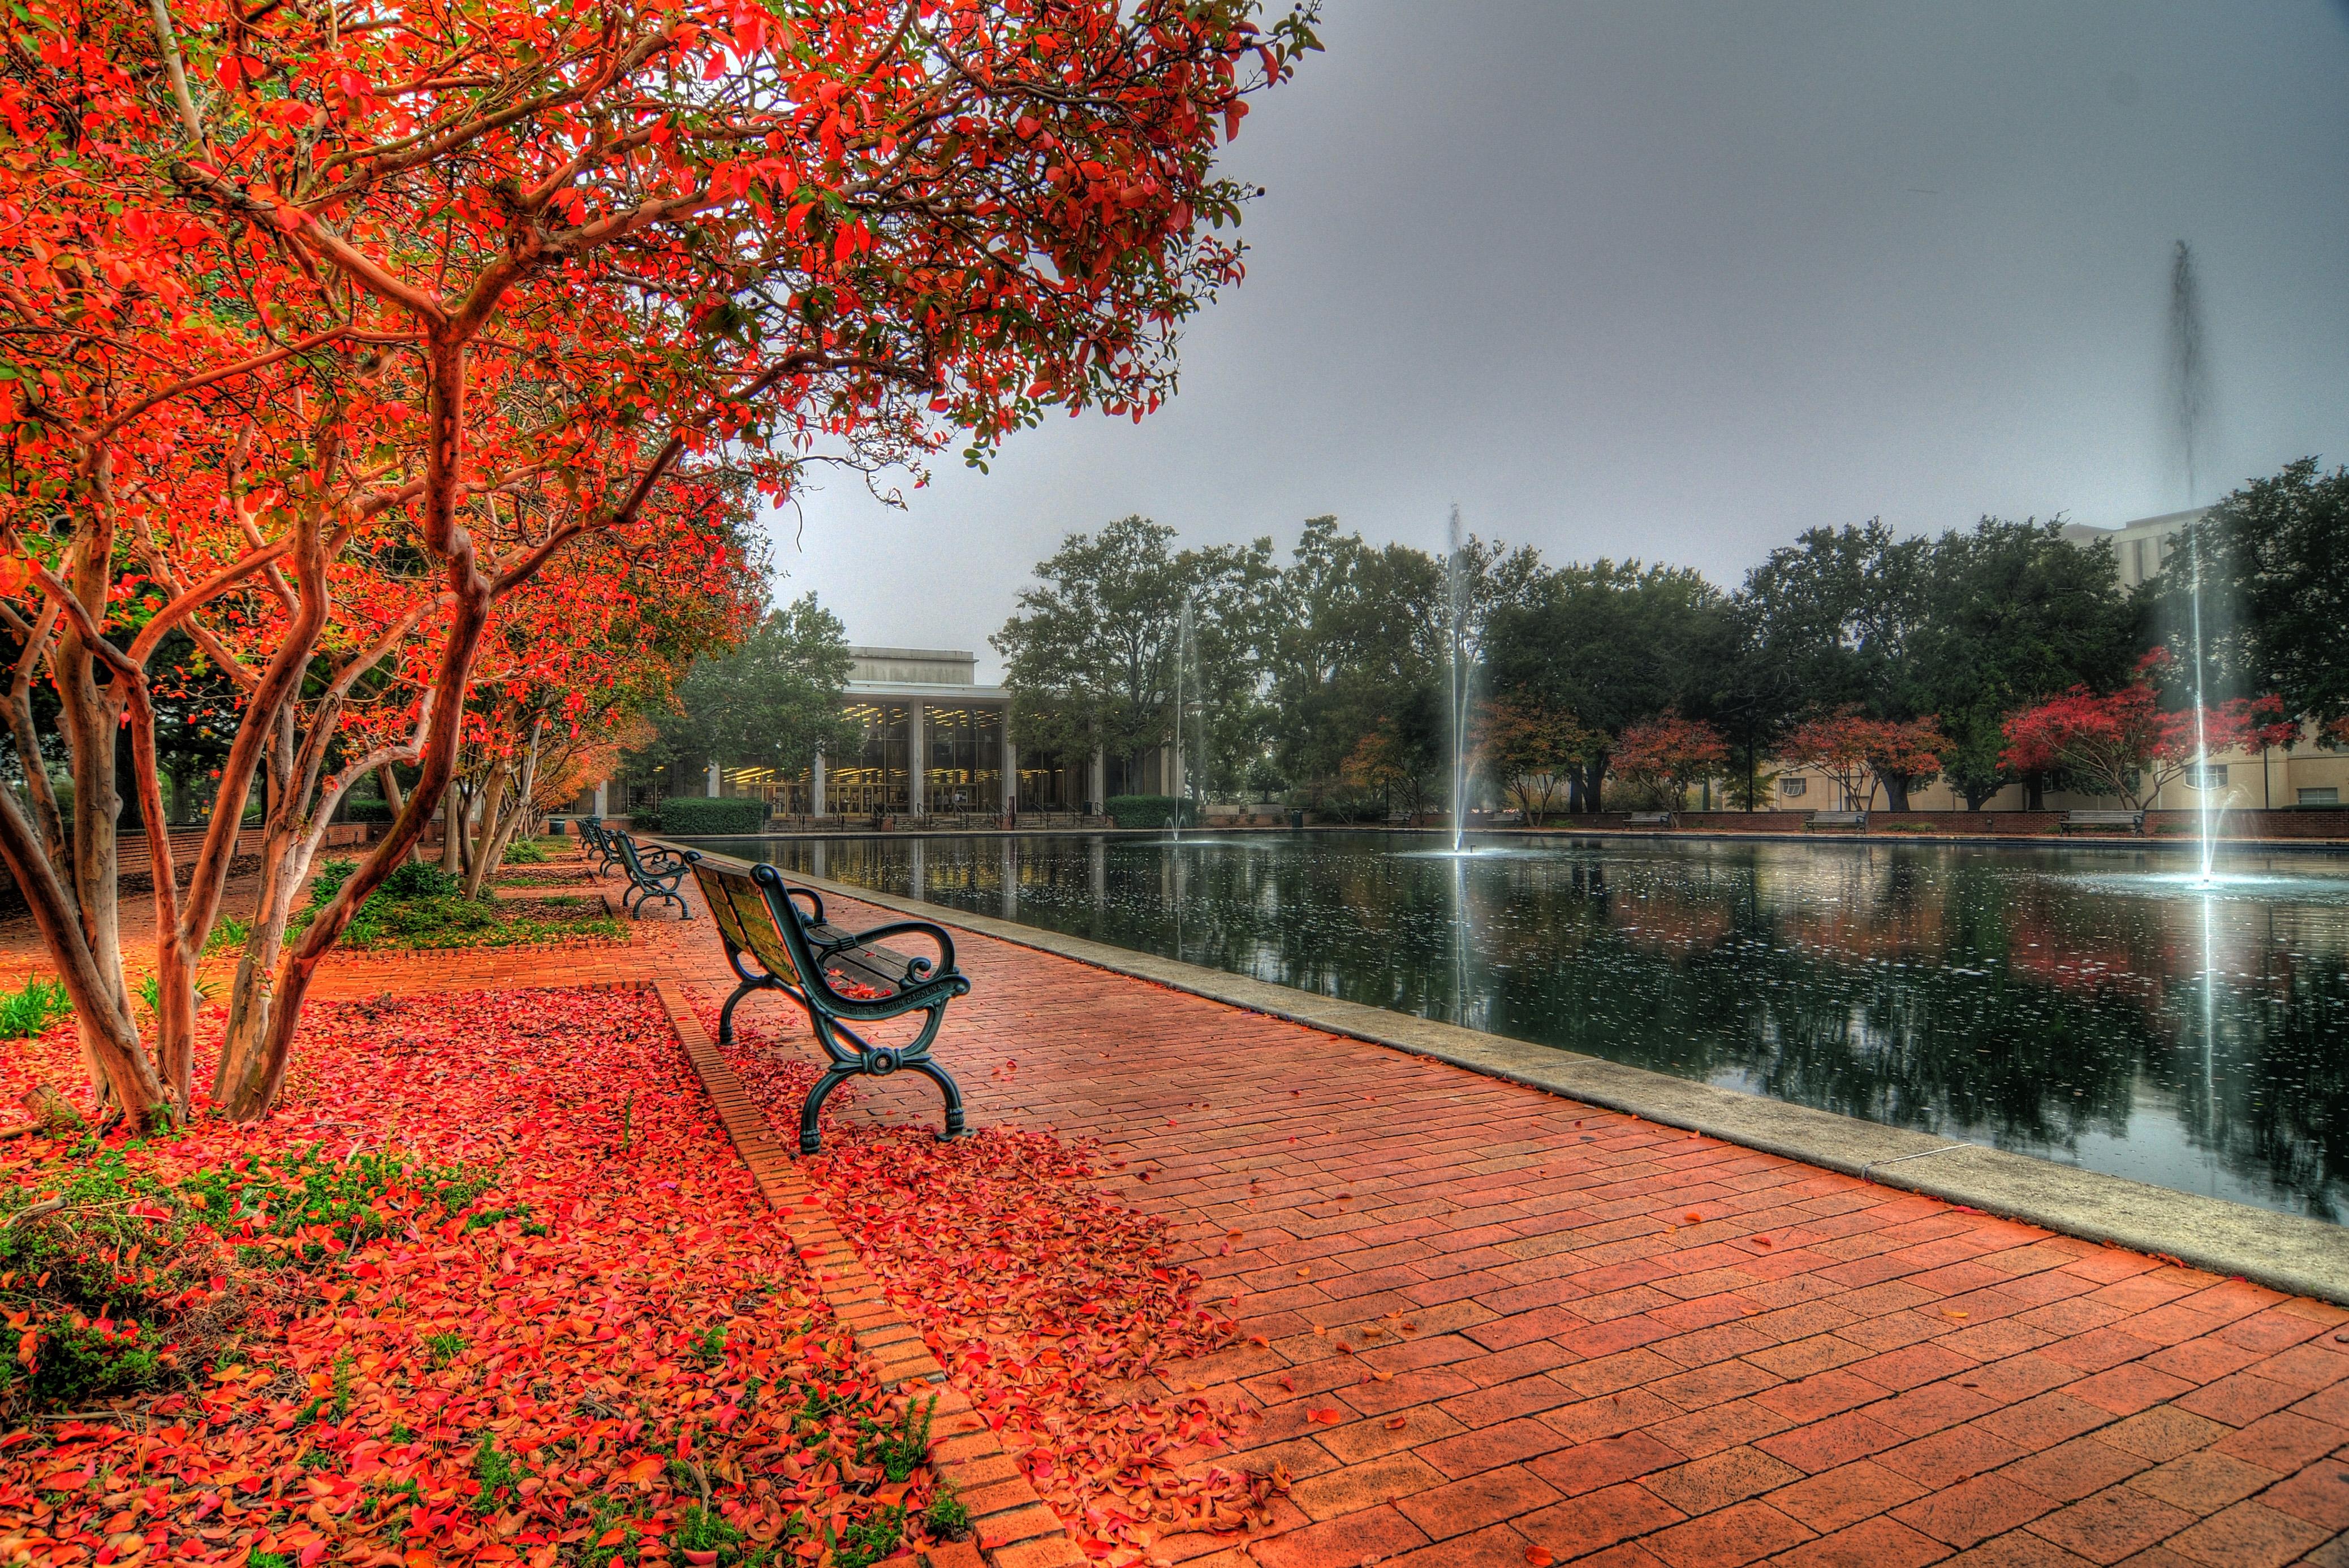 University of South Carolina Campus Autumn HDR Photos Ken Bloch 4153x2773